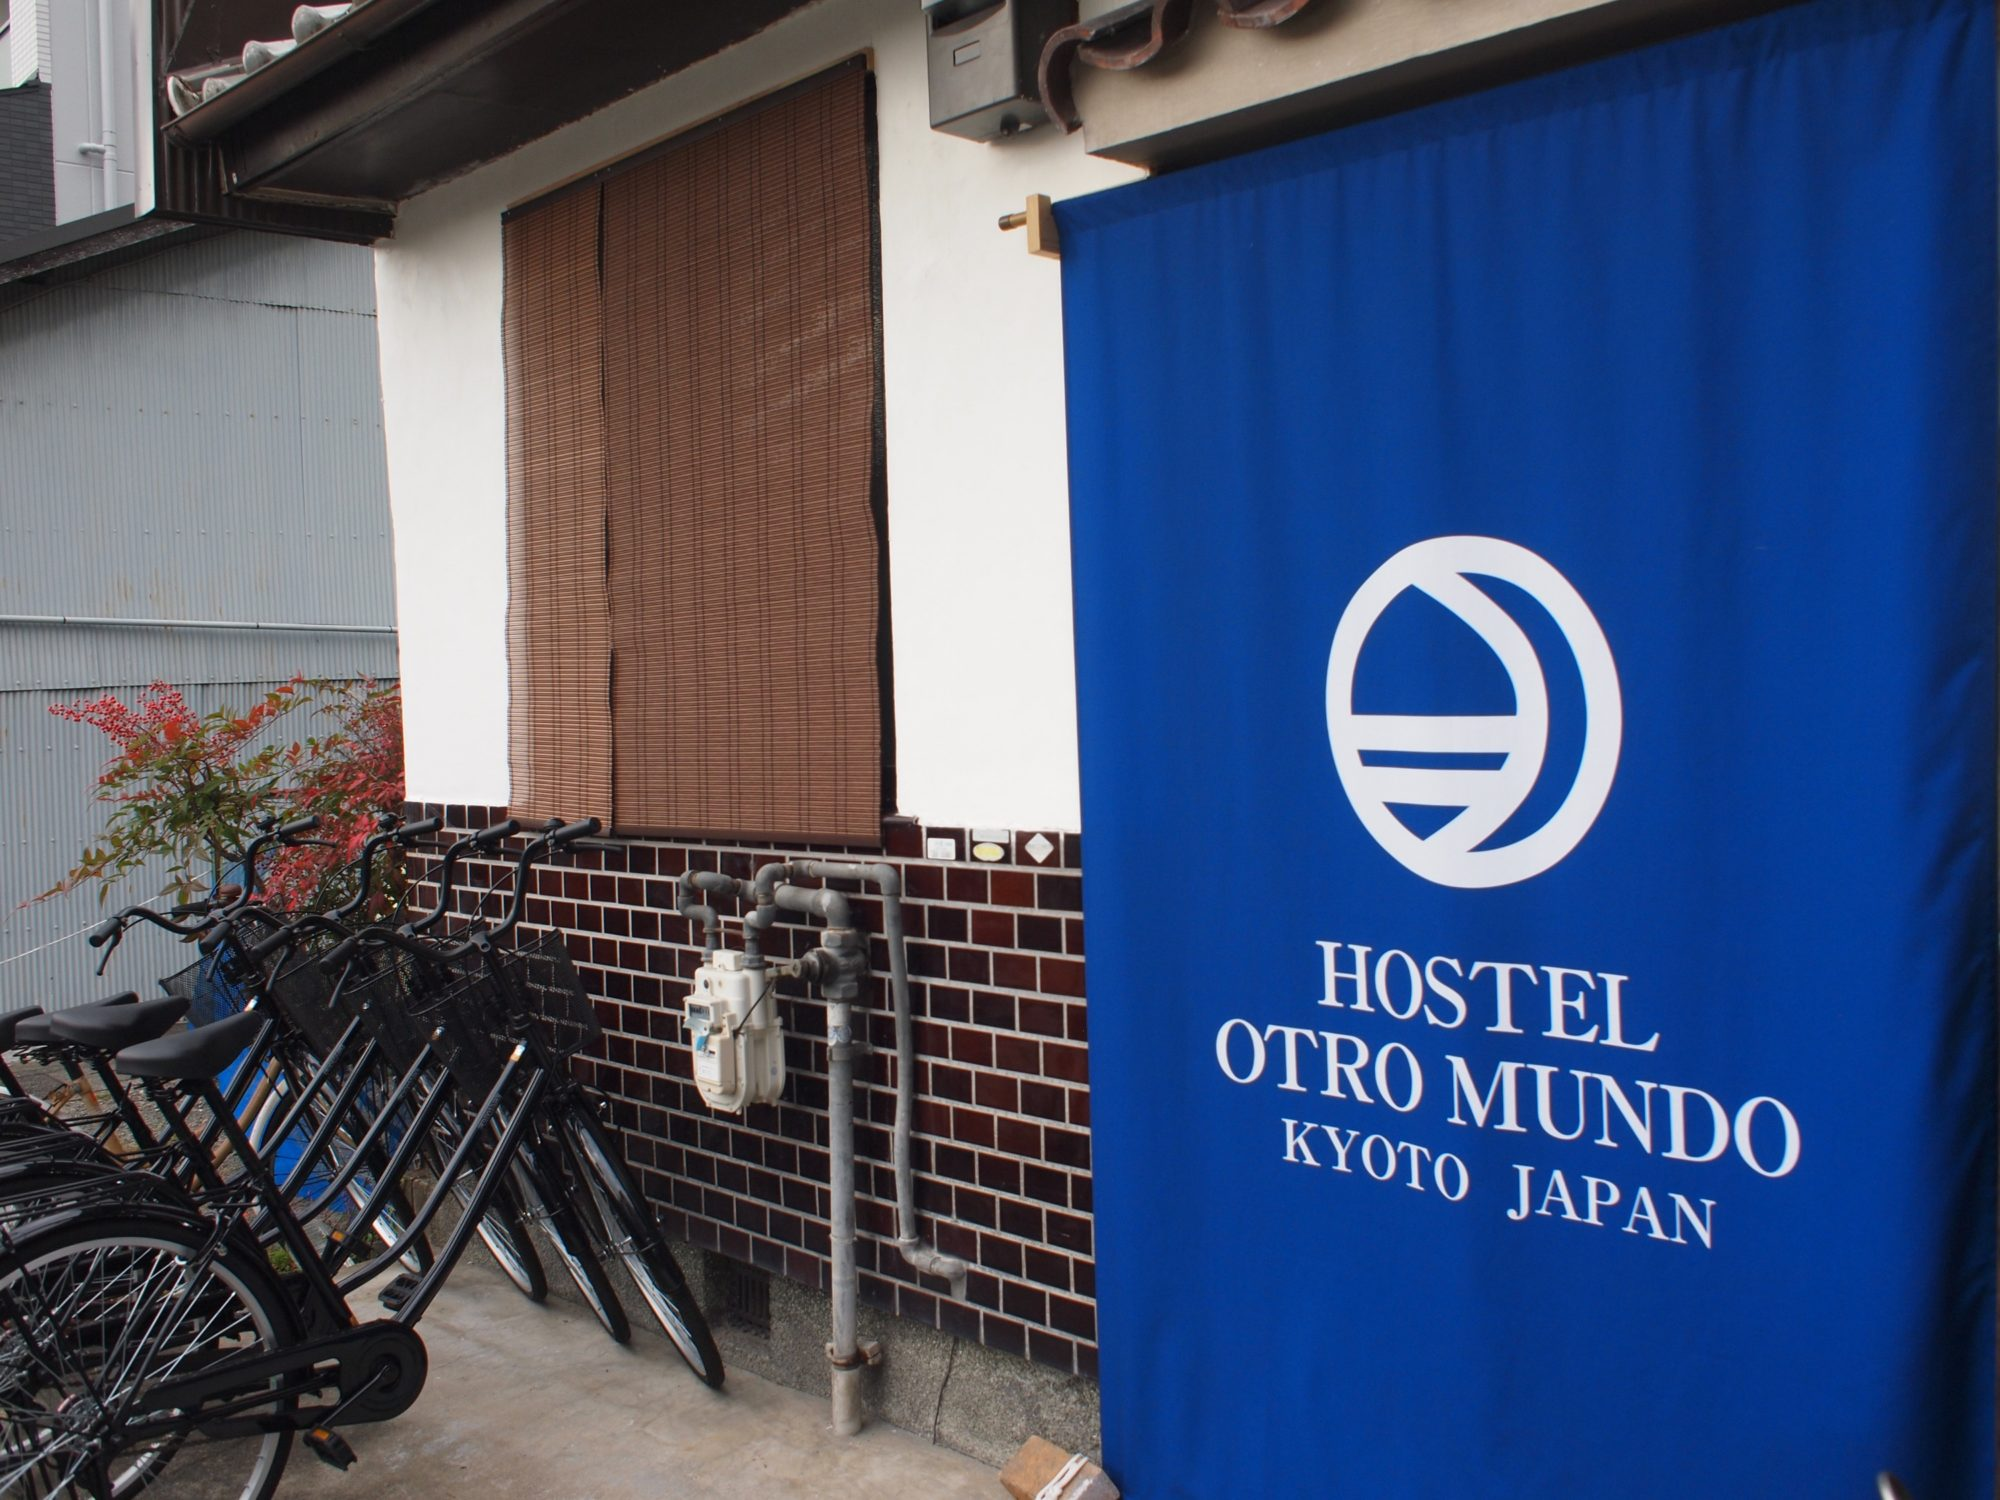 MUNDOotro_entrance